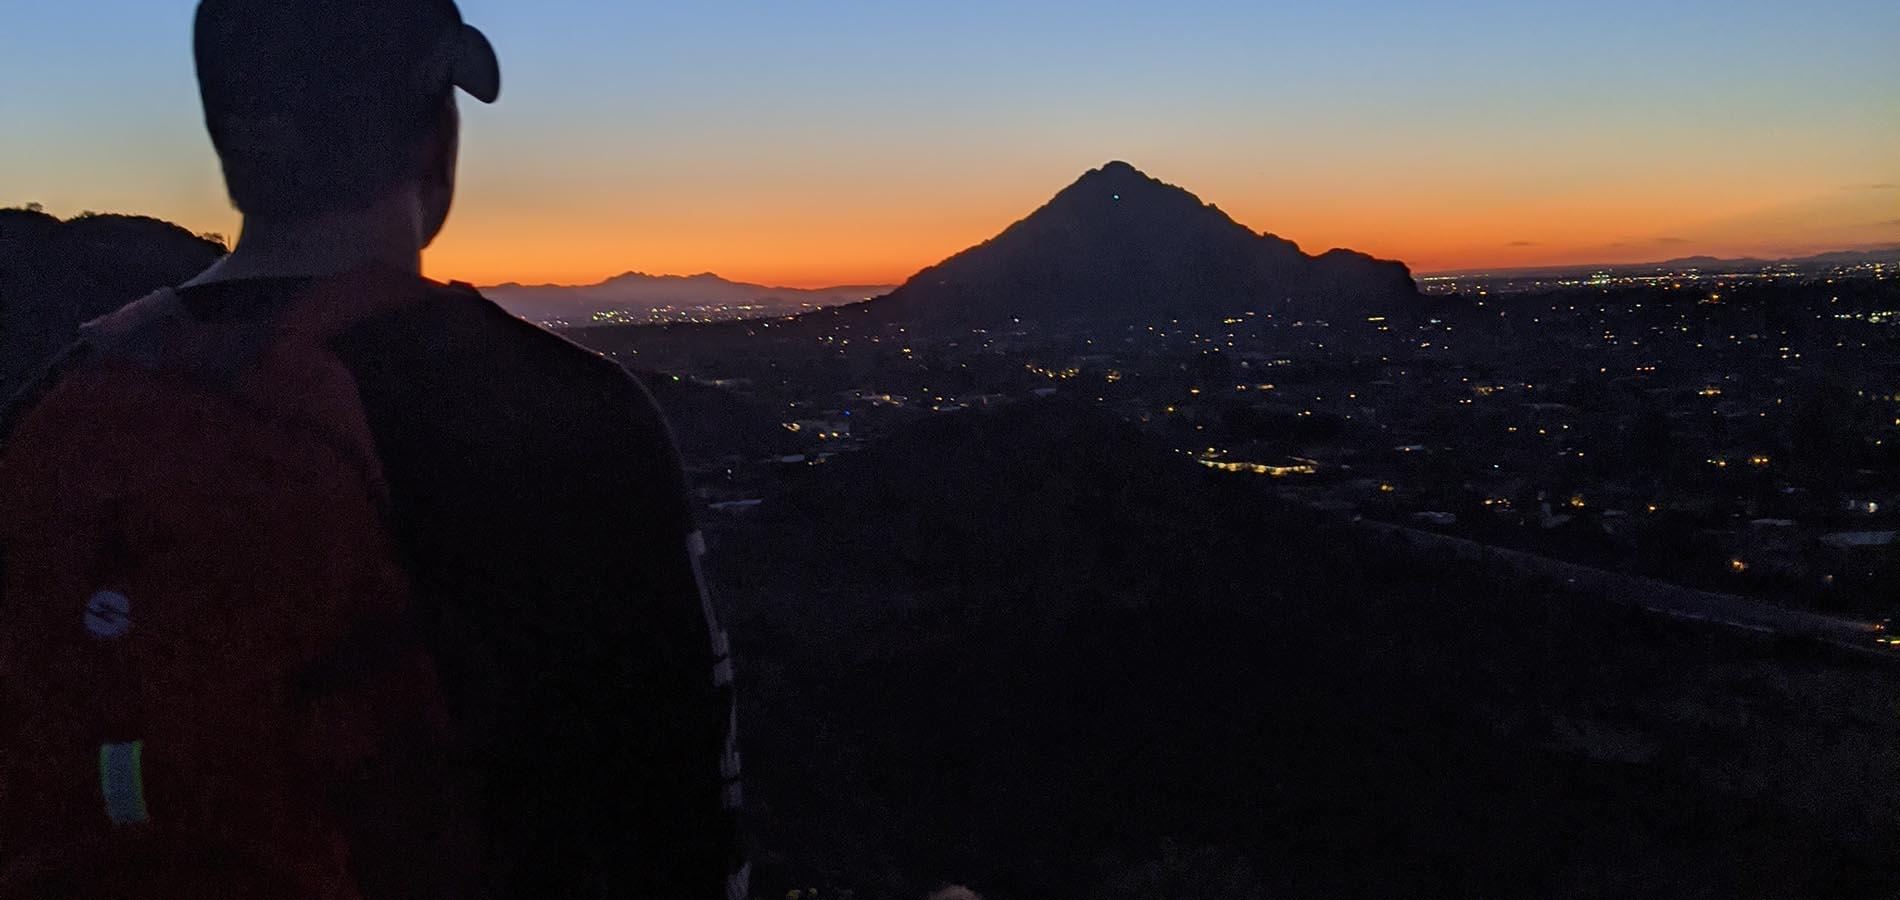 Sunset Hiking Tour in Phoenix and Scottsdale, AZ